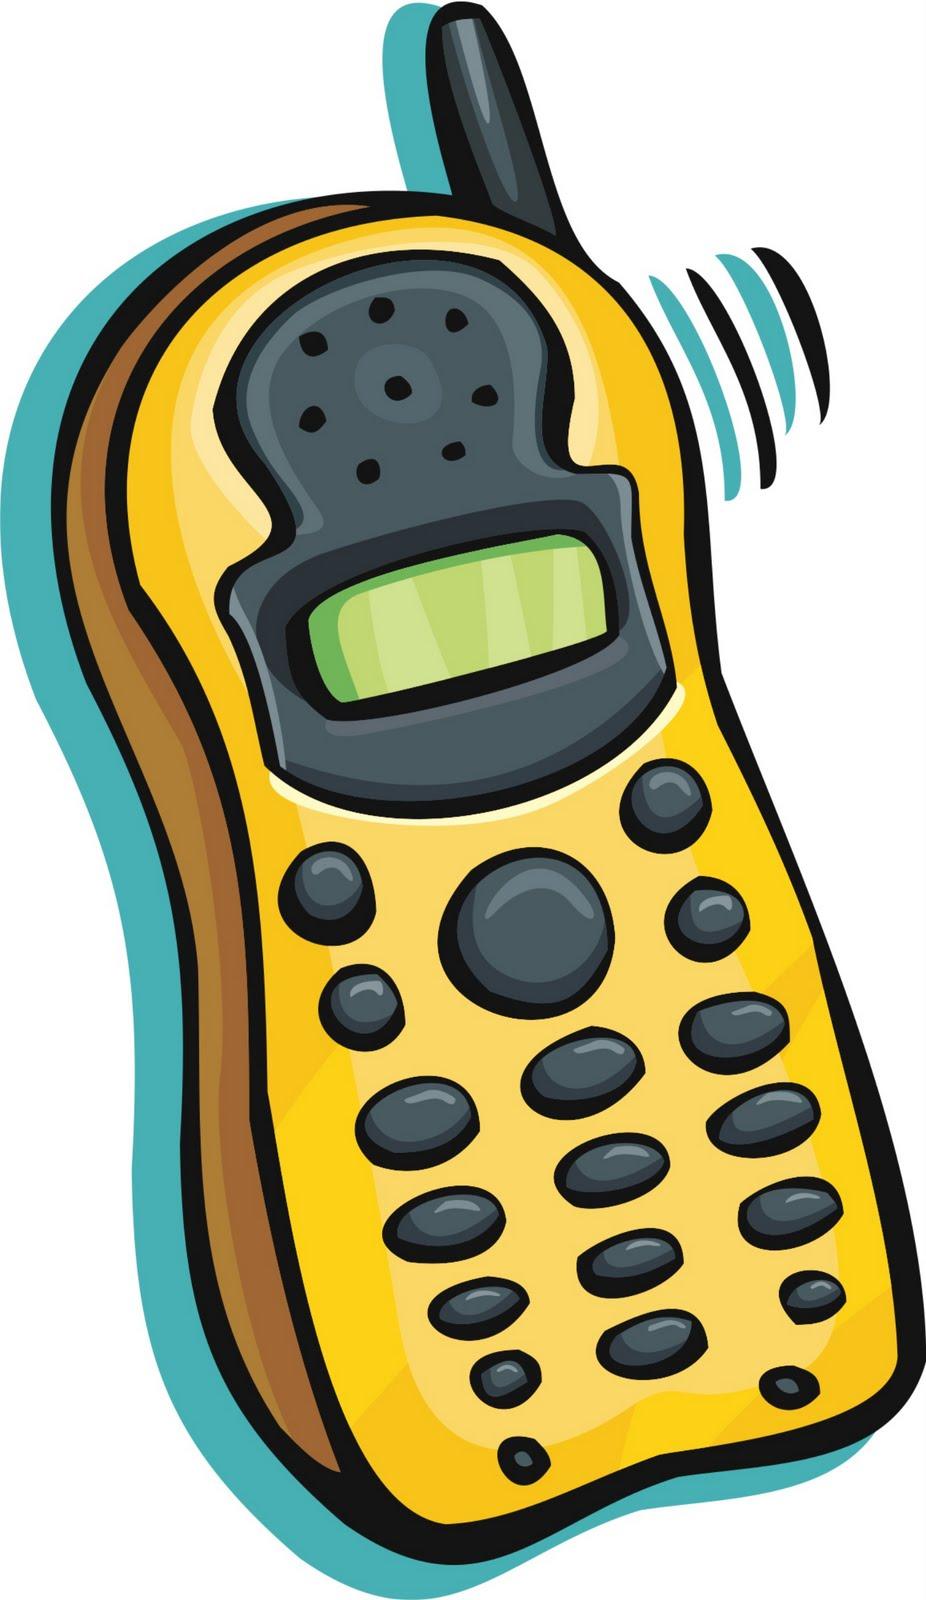 Telephone clipart funny Clipart Telephone Telephone Phone